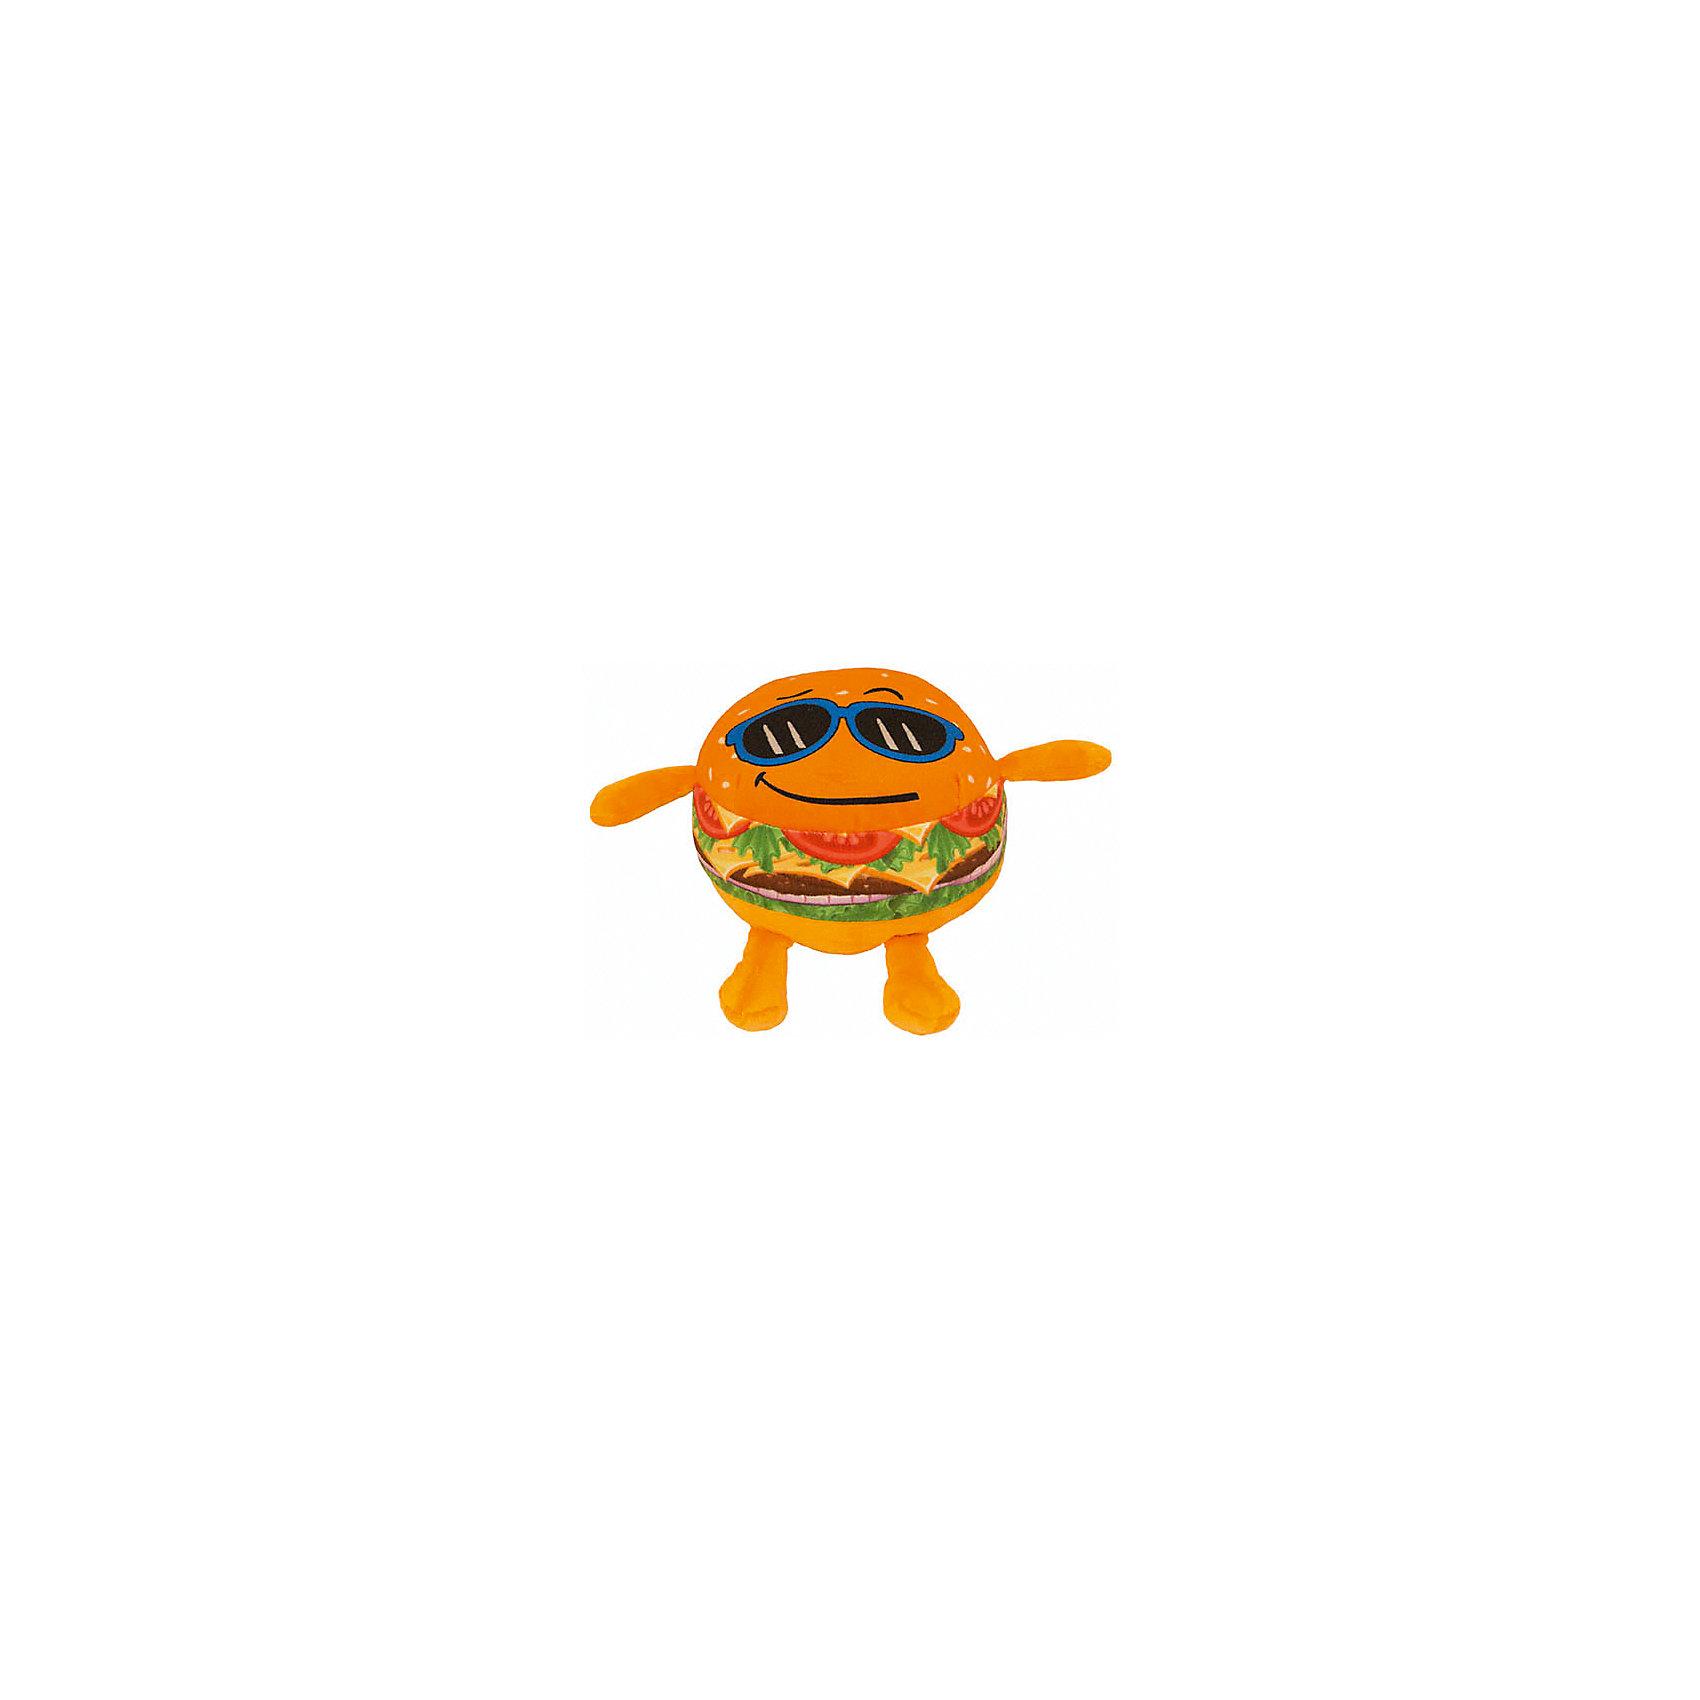 Button Blue Крутой бургер, Button Blue большую мягкую игрушку собаку лежа в москве